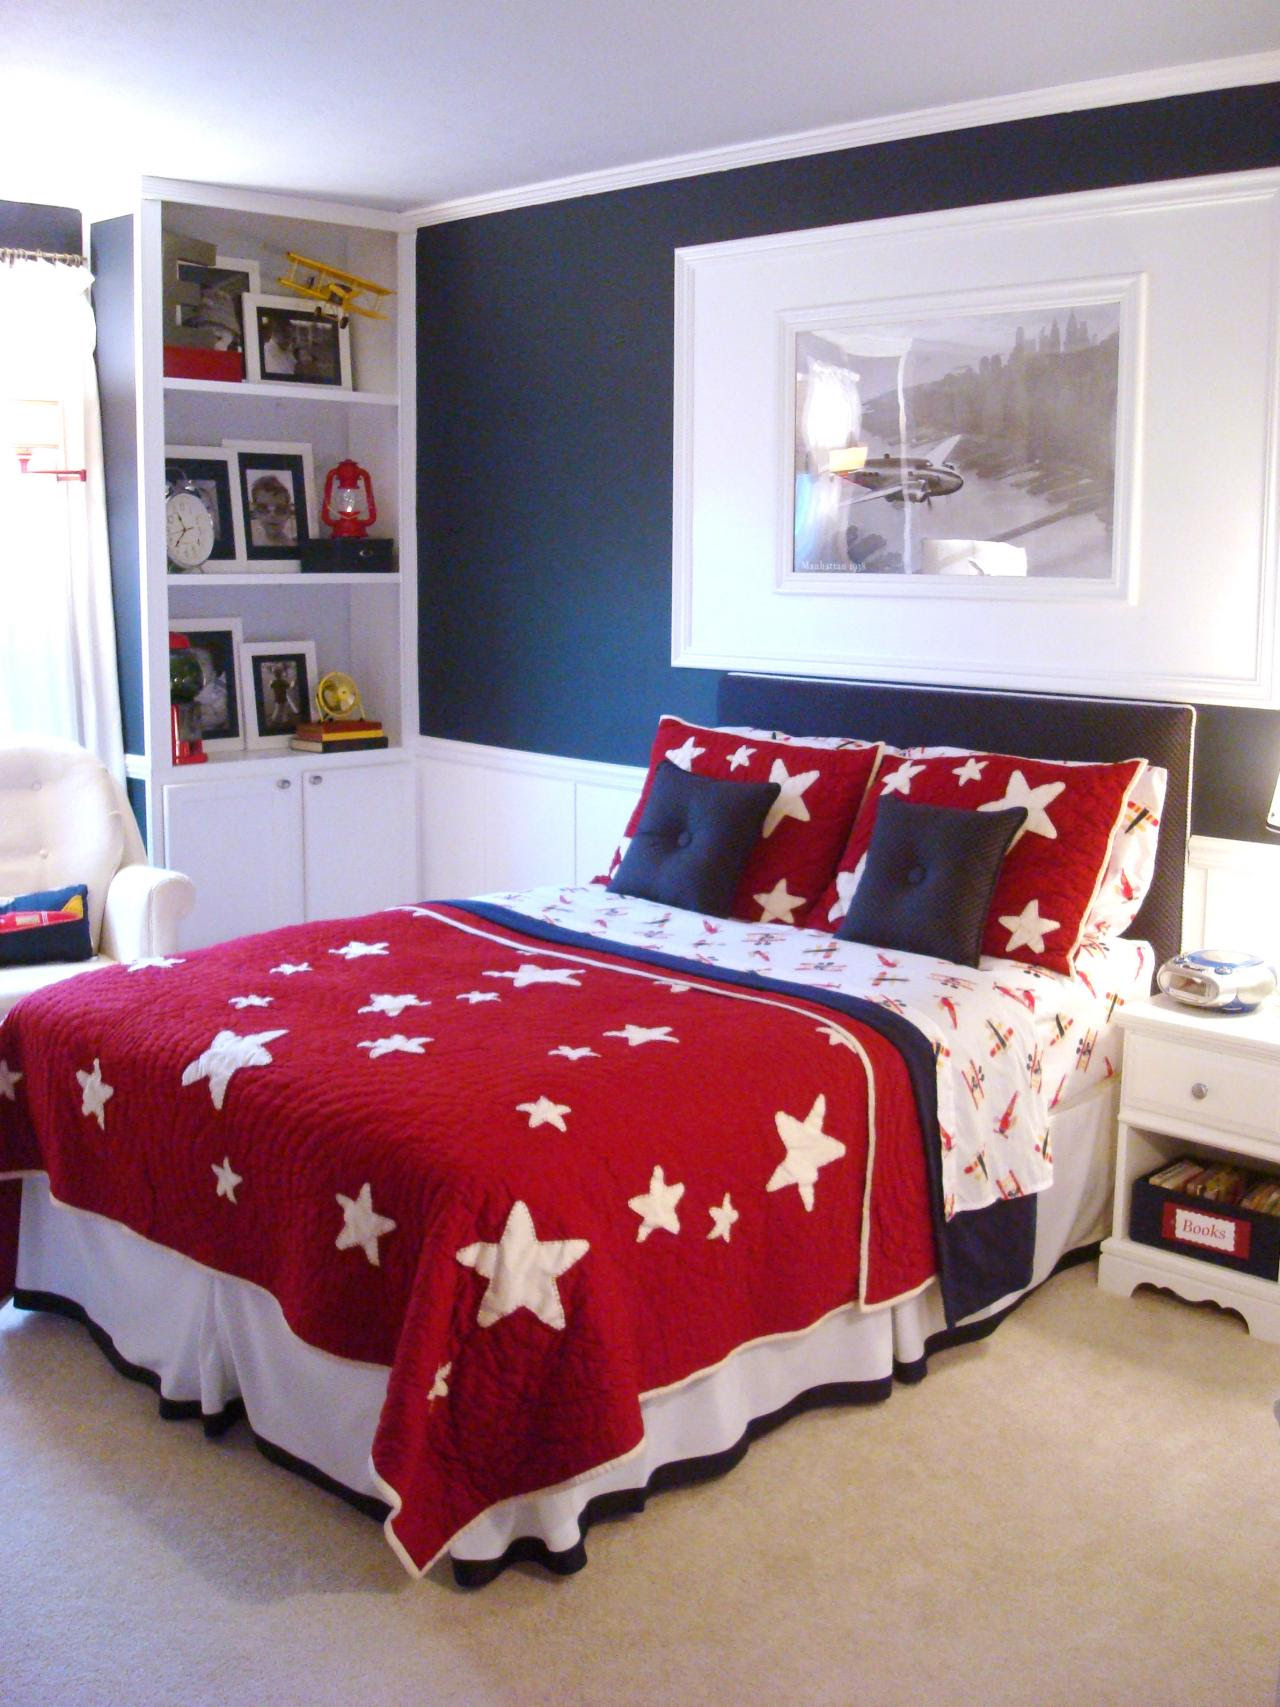 Bedroom Decorating Ideas In Blue Bedroom Decorating